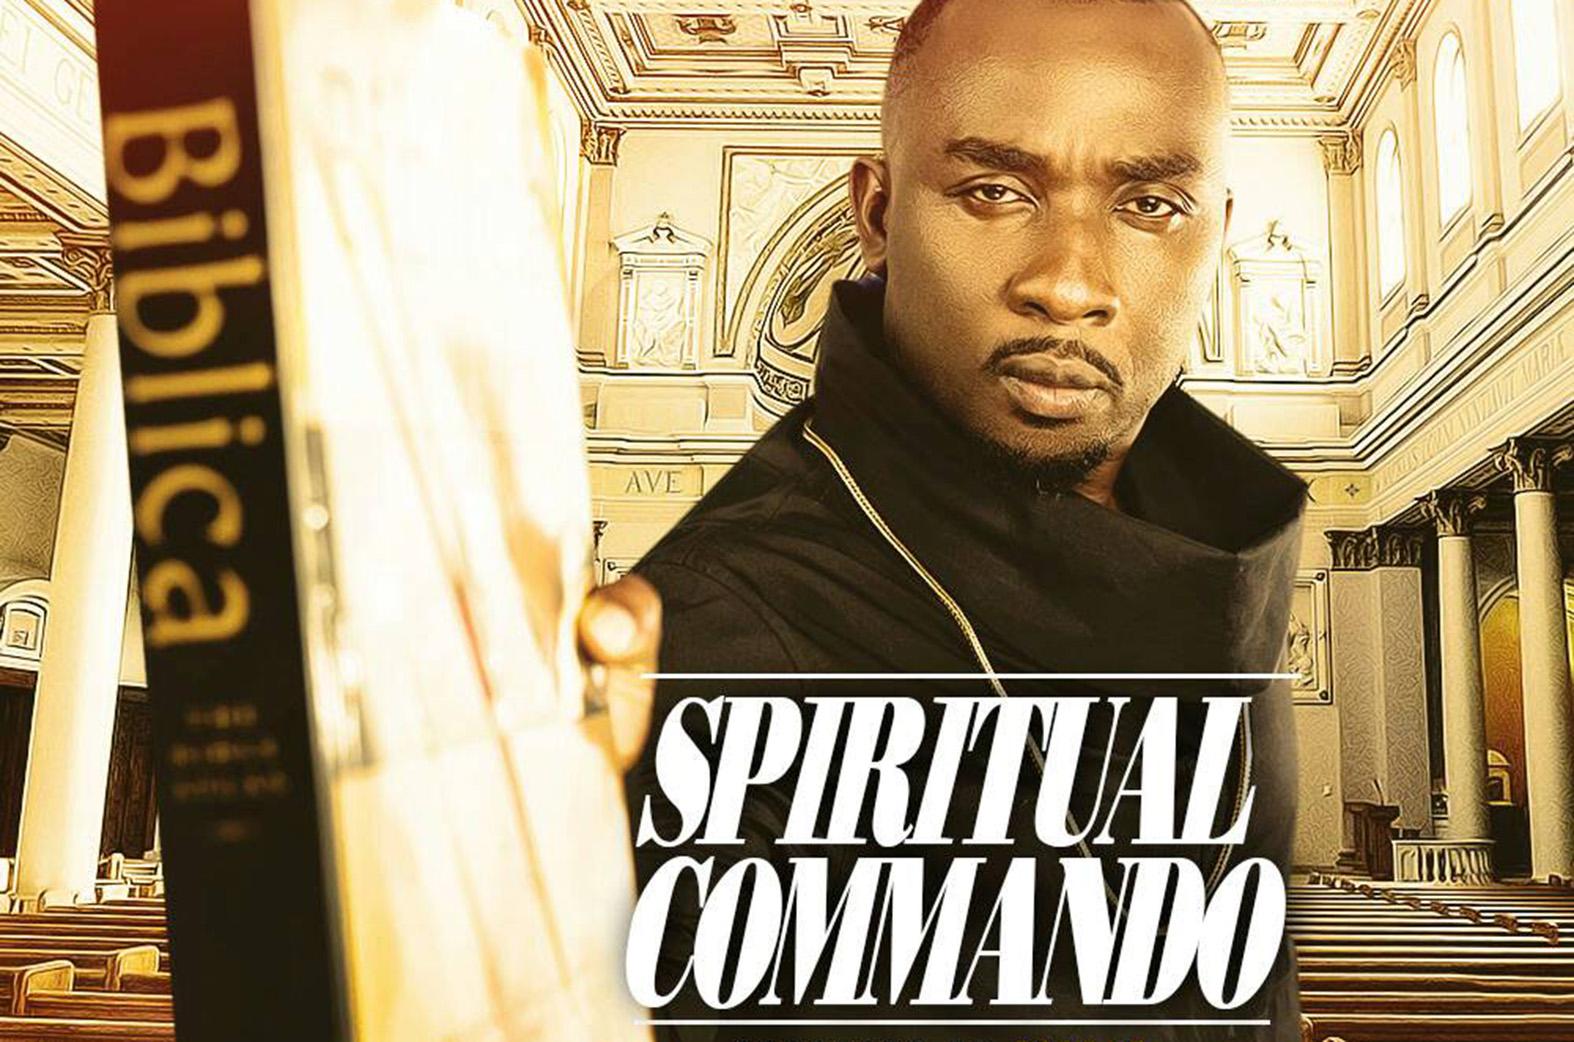 Australia based Jay Peacock out with 'Spiritual Commando'